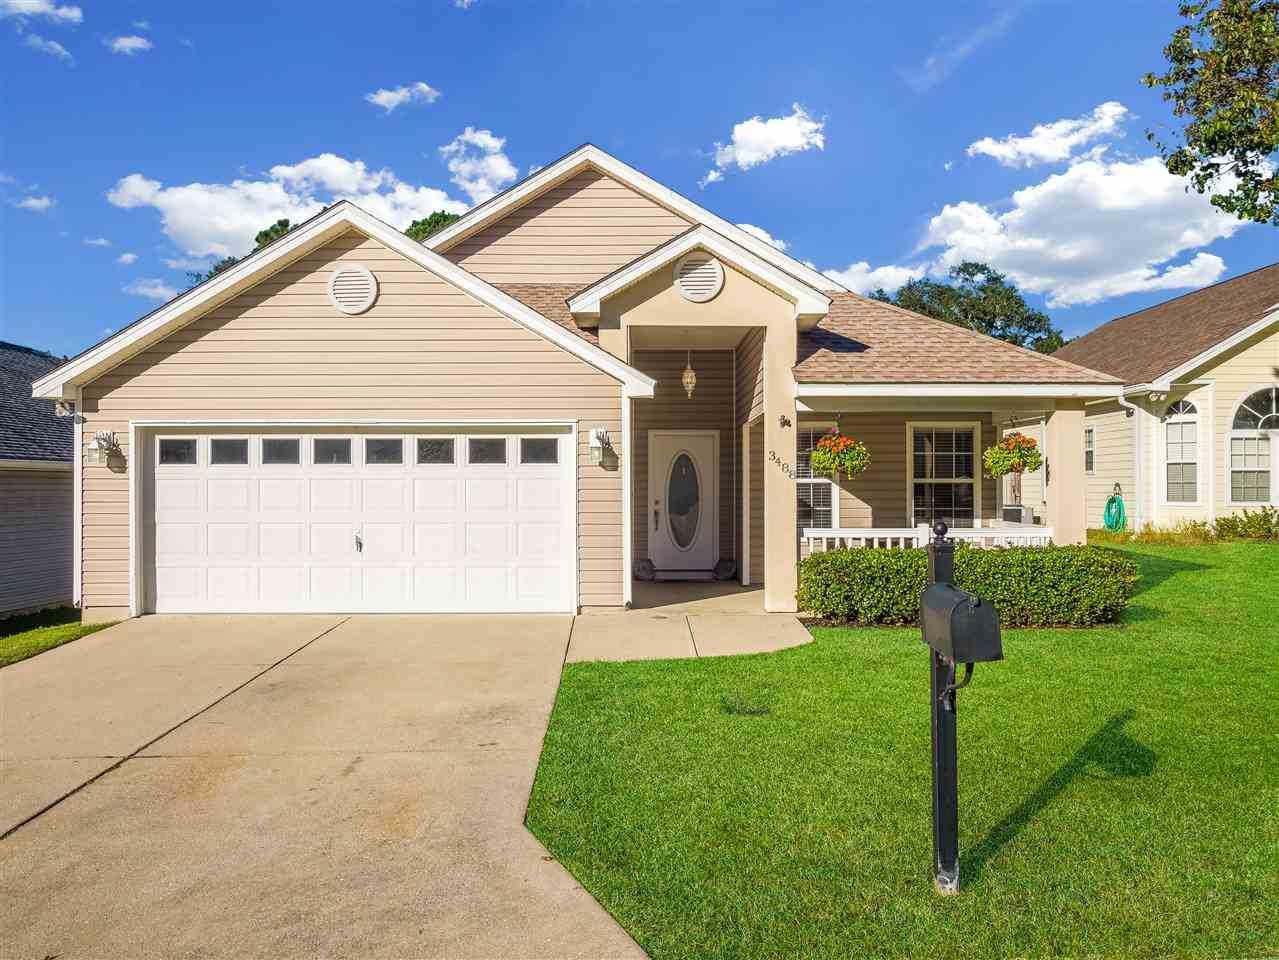 3488 Barnstaple Drive Tallahassee, FL 32317 in Weems Plantation Photo 1